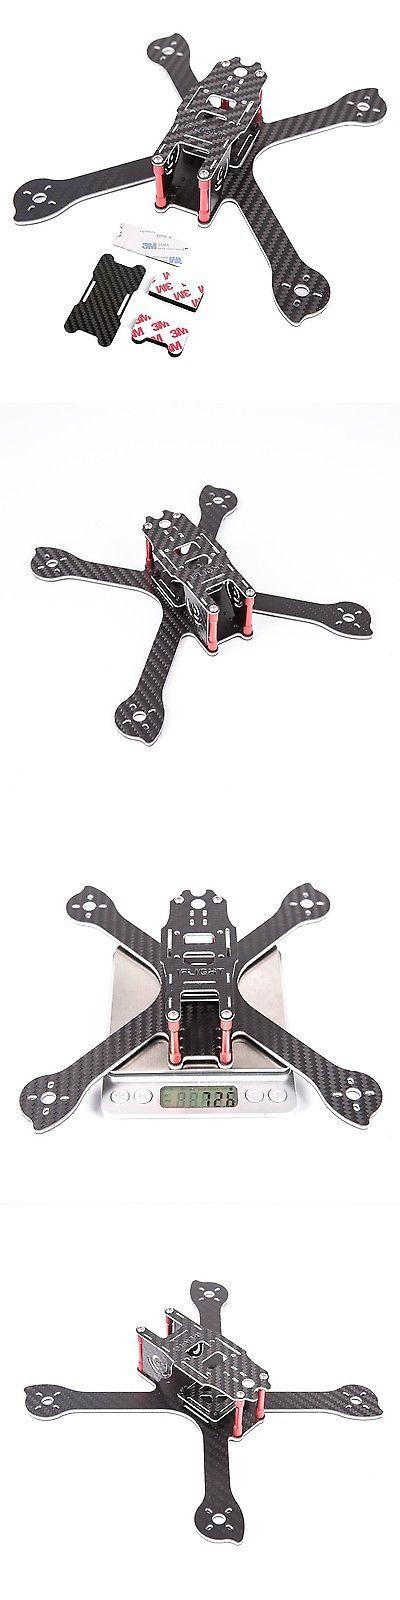 Radio Control 51029: Iflight Racer Ix5s 200Mm Fpv Racing Quadcopter Frame Kit Enhanced Version Com... -> BUY IT NOW ONLY: $48.39 on eBay!